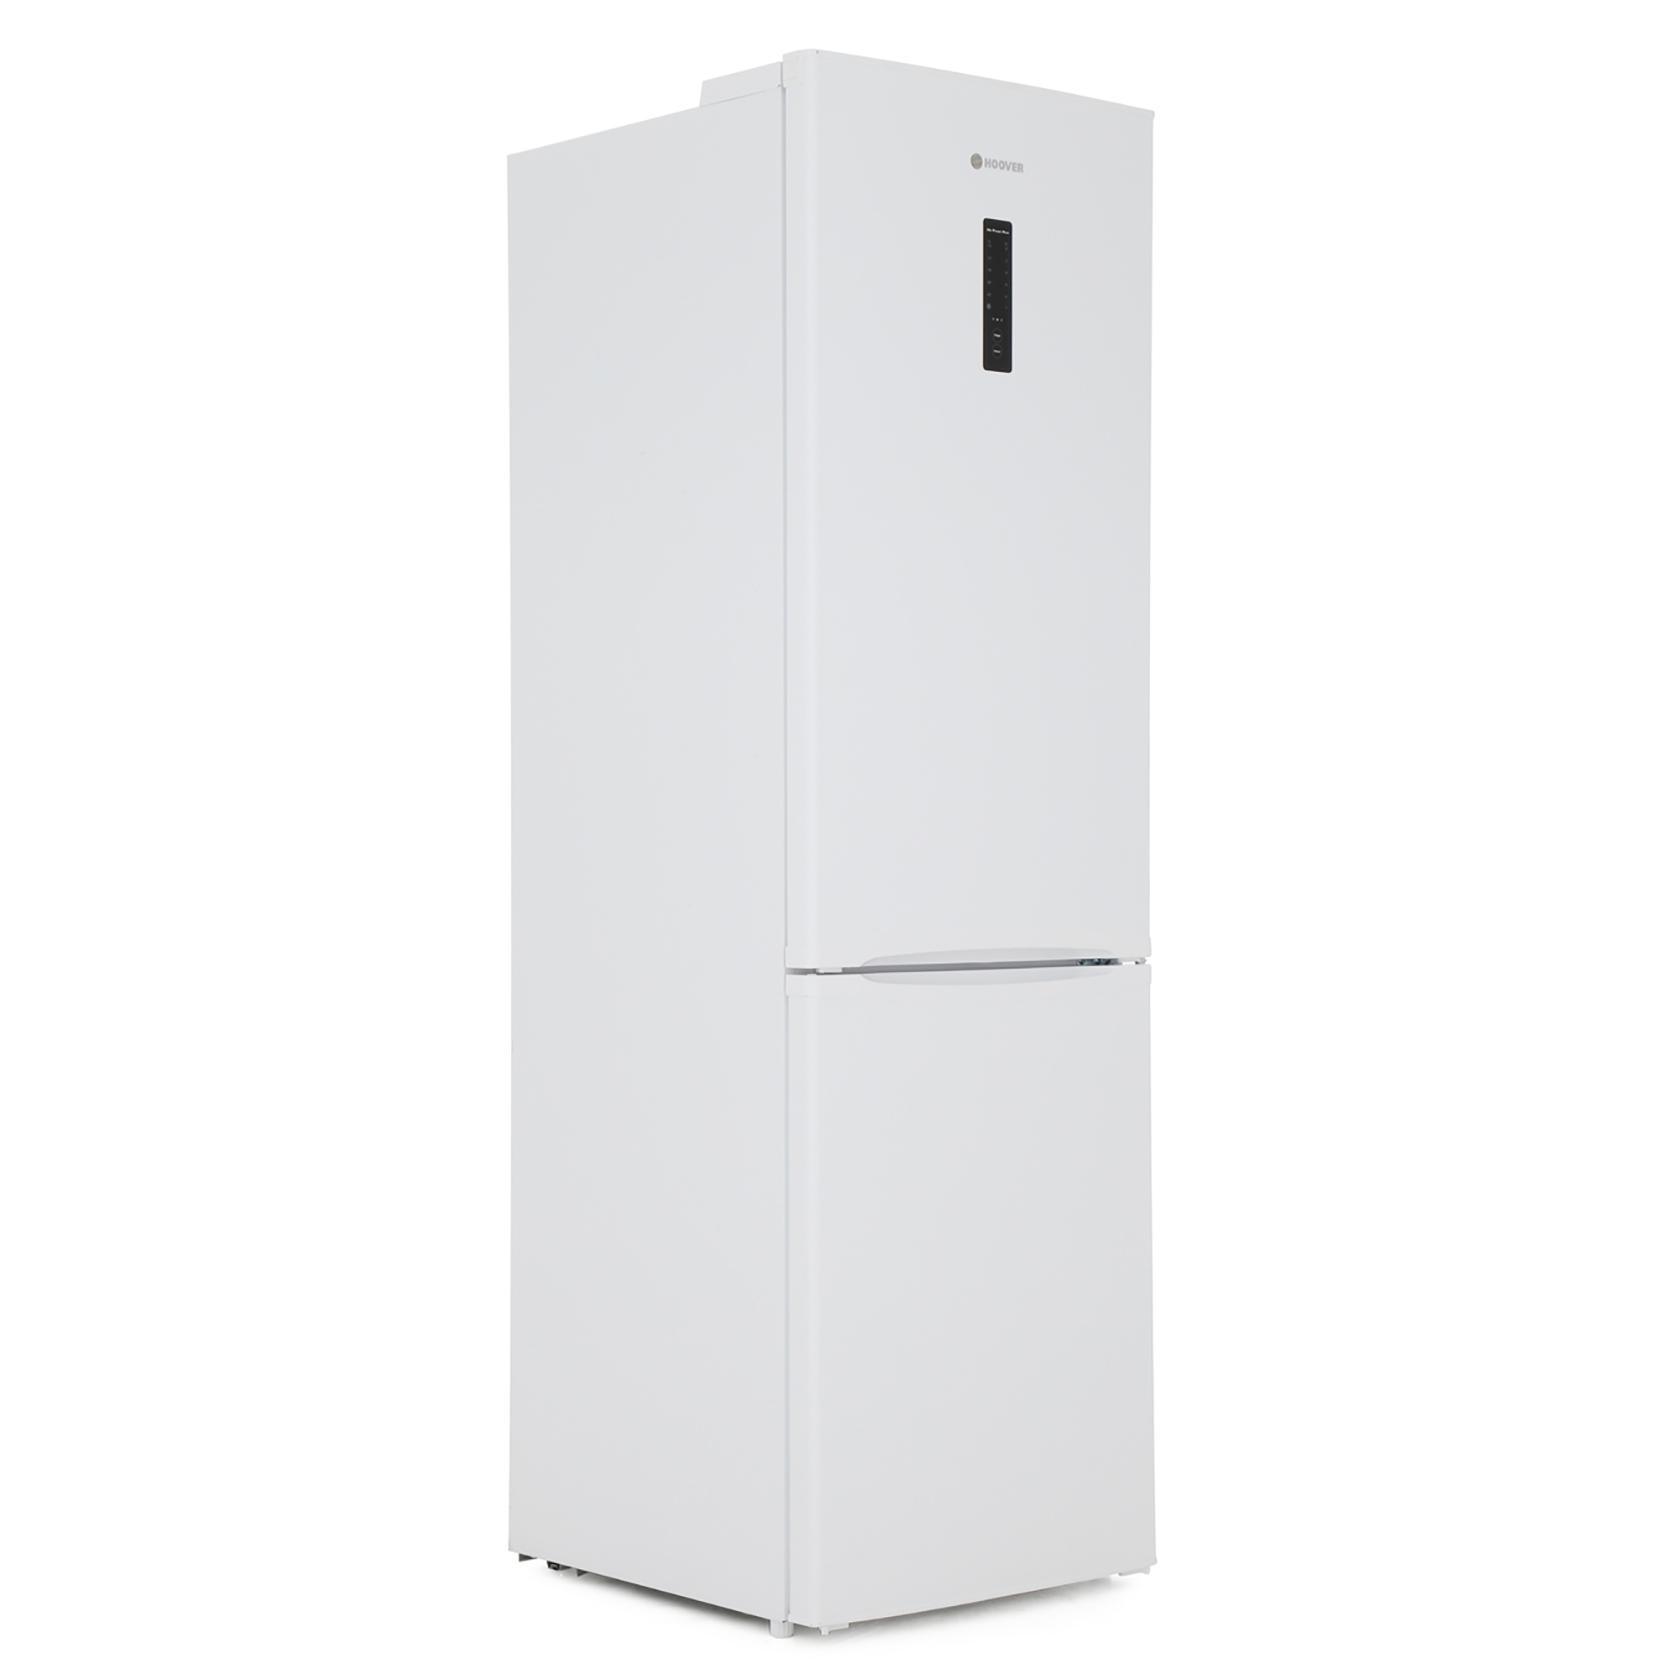 Hoover Fridge Freezer Hcn6202wk White